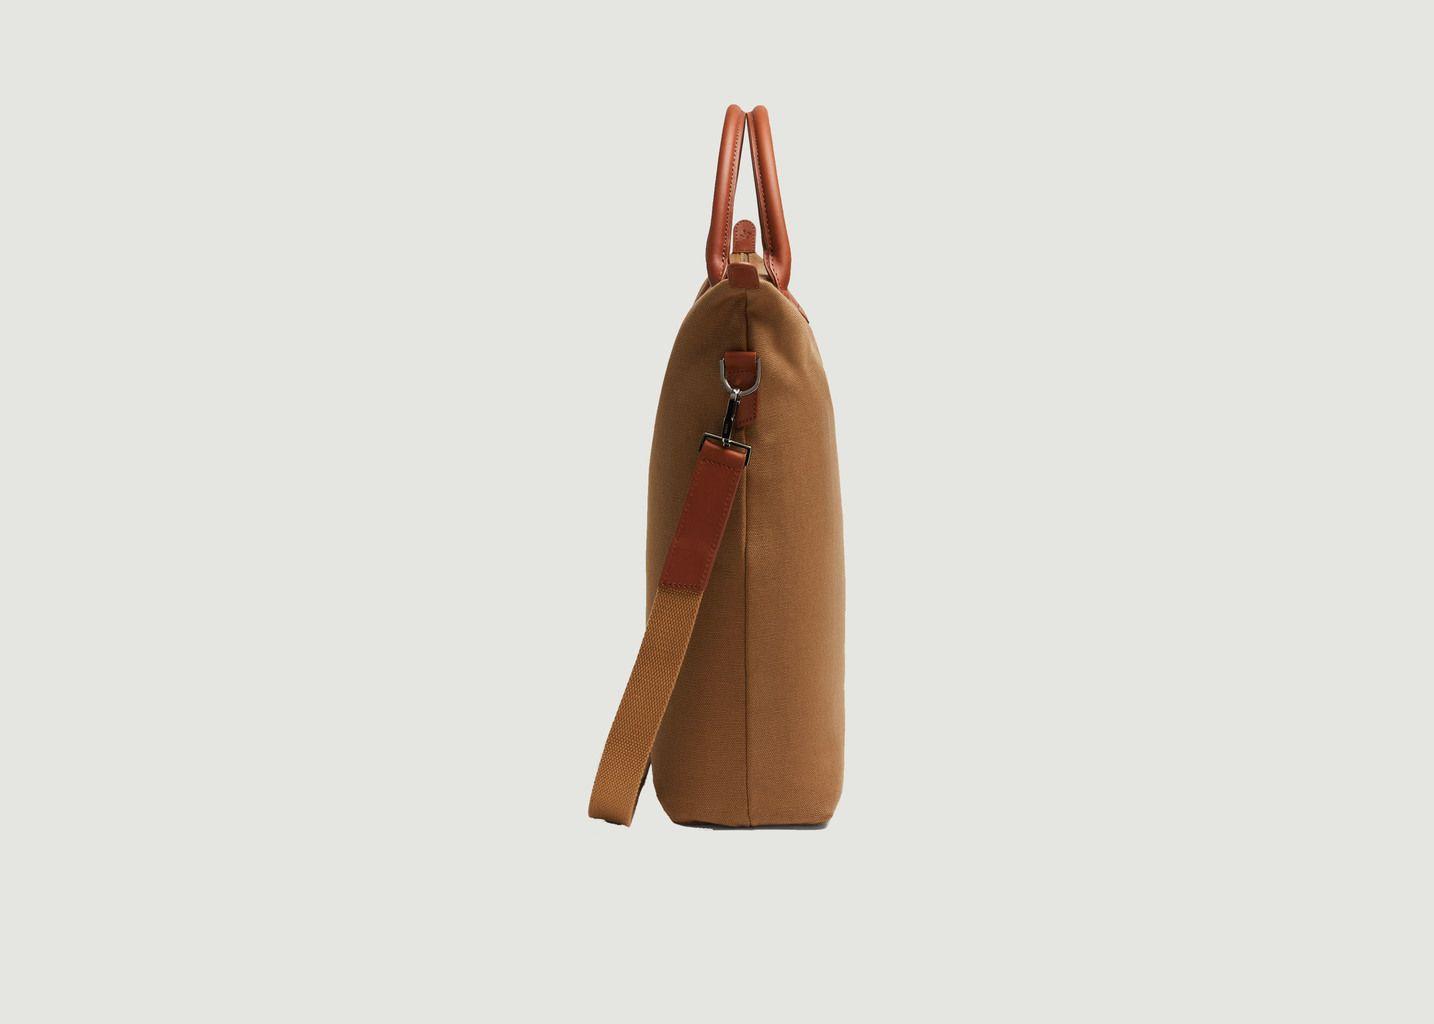 OHare Shopper Tote  - Want Les Essentiels